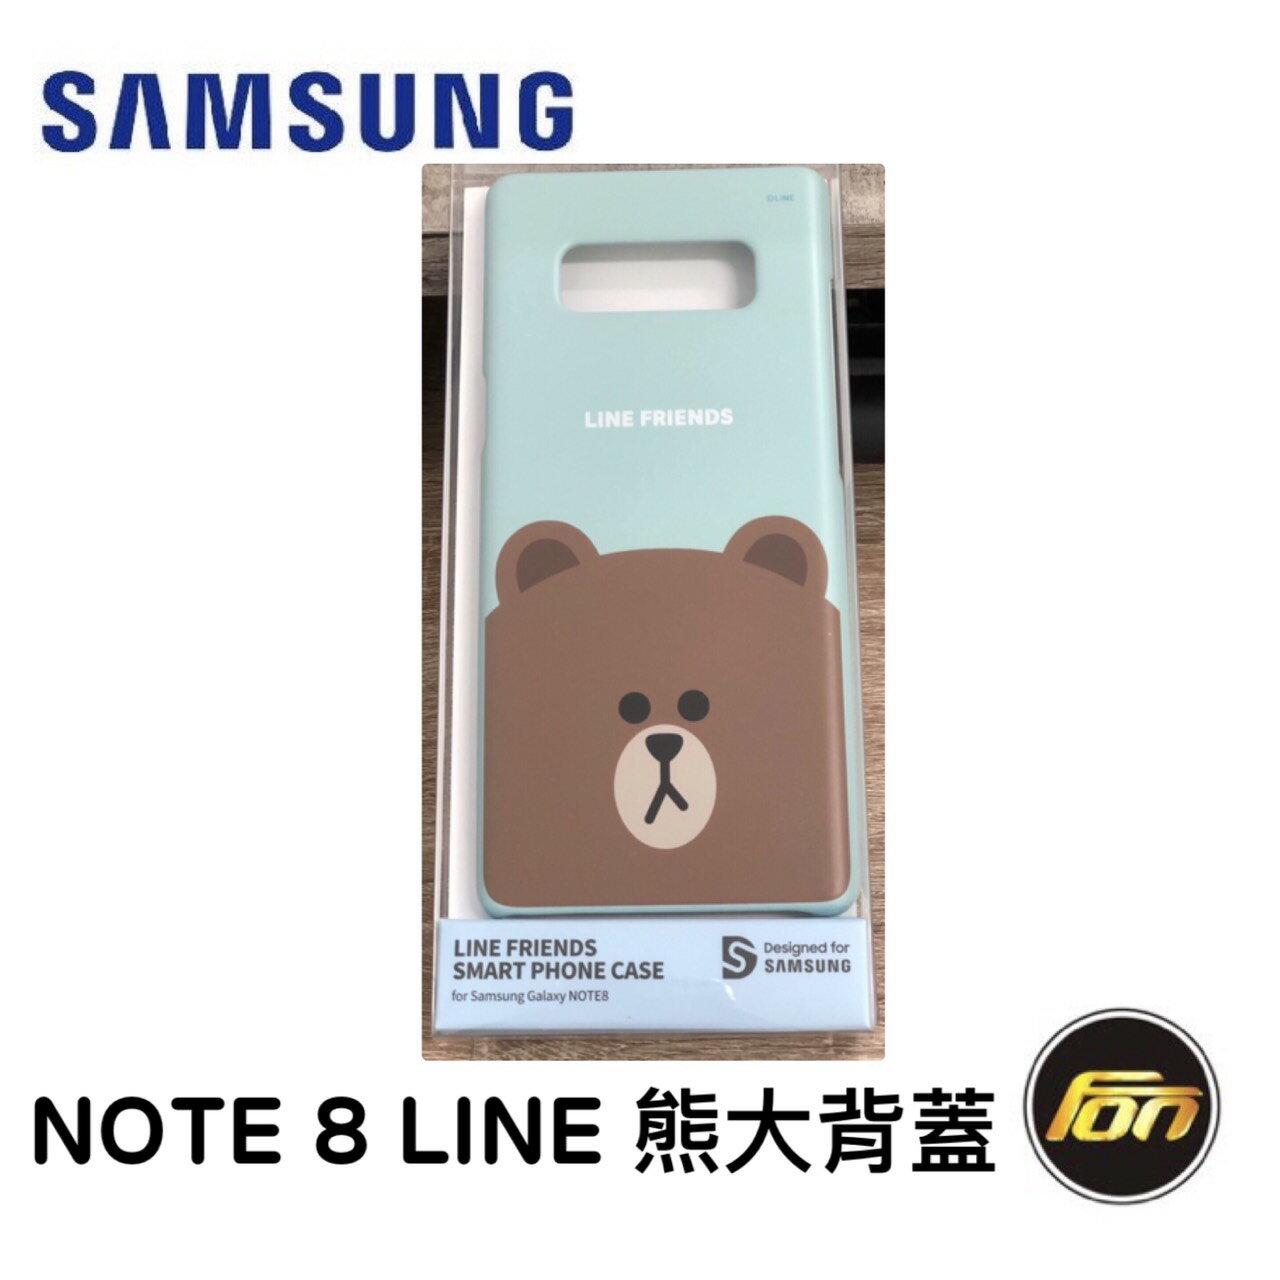 SAMSUNG NOTE 8 LINE熊大 背蓋 保護套 保護殼 - 限時優惠好康折扣